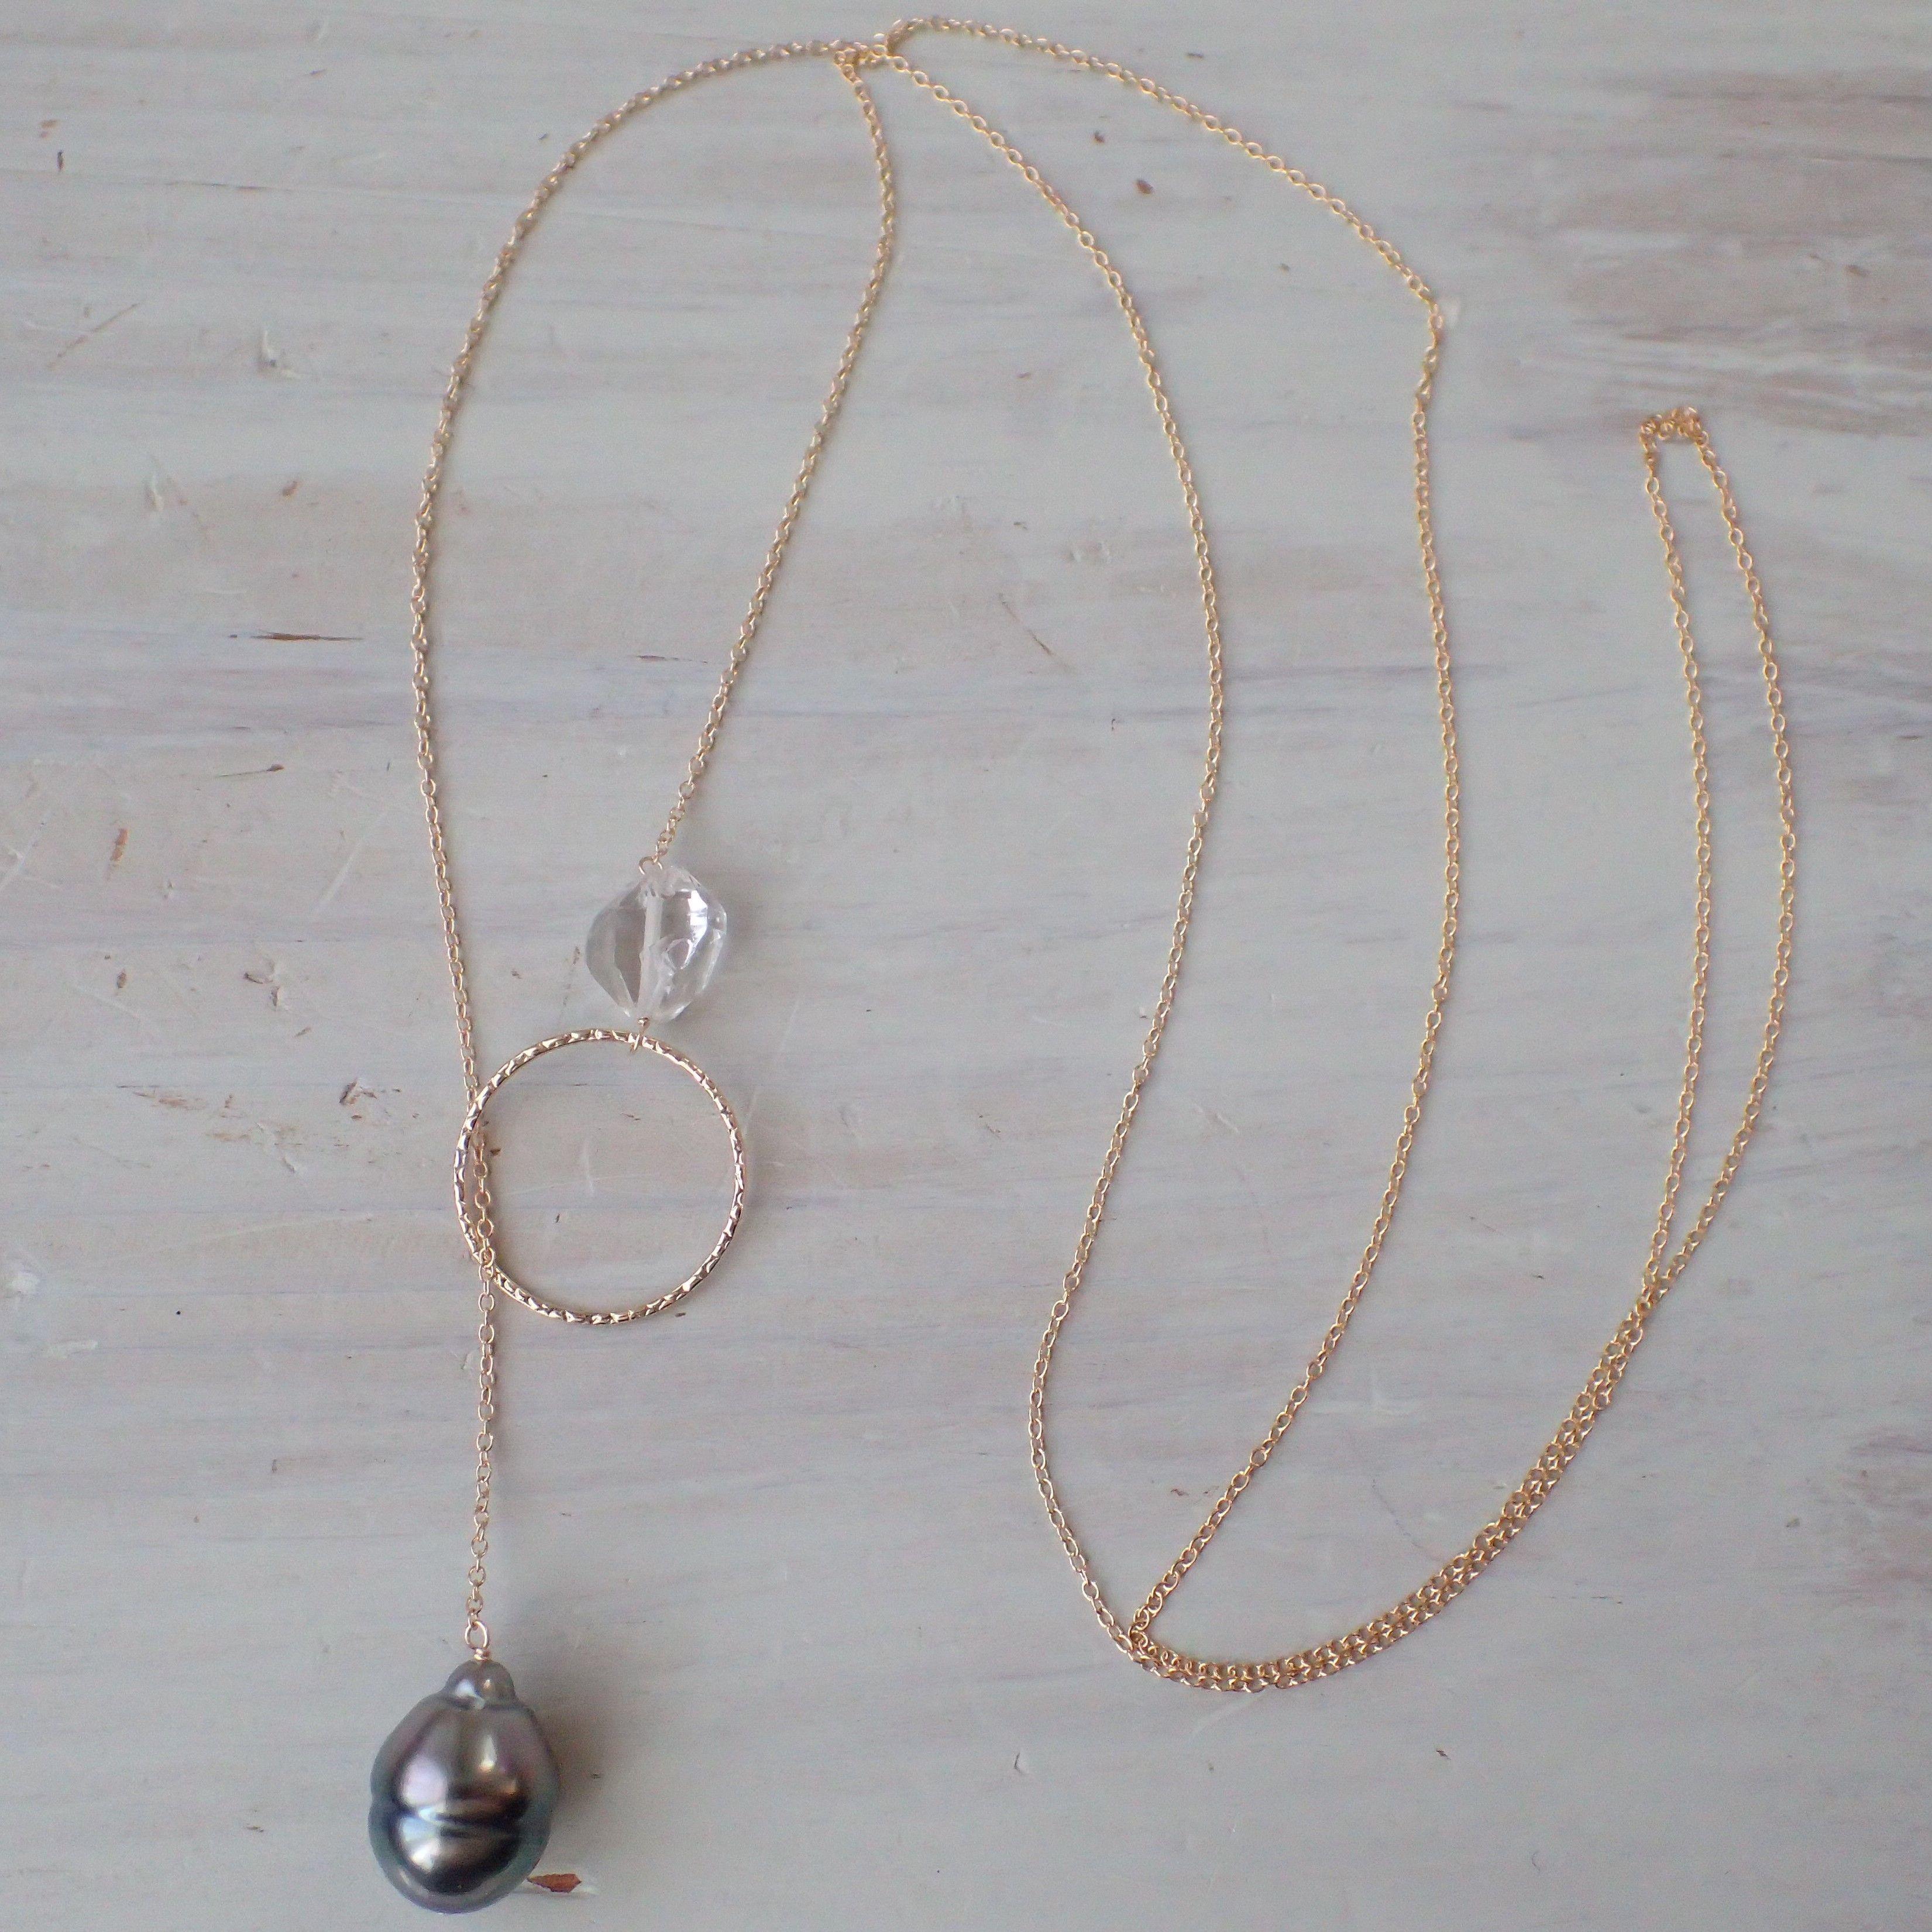 K14GF tahitian pearl adjustable long necklace